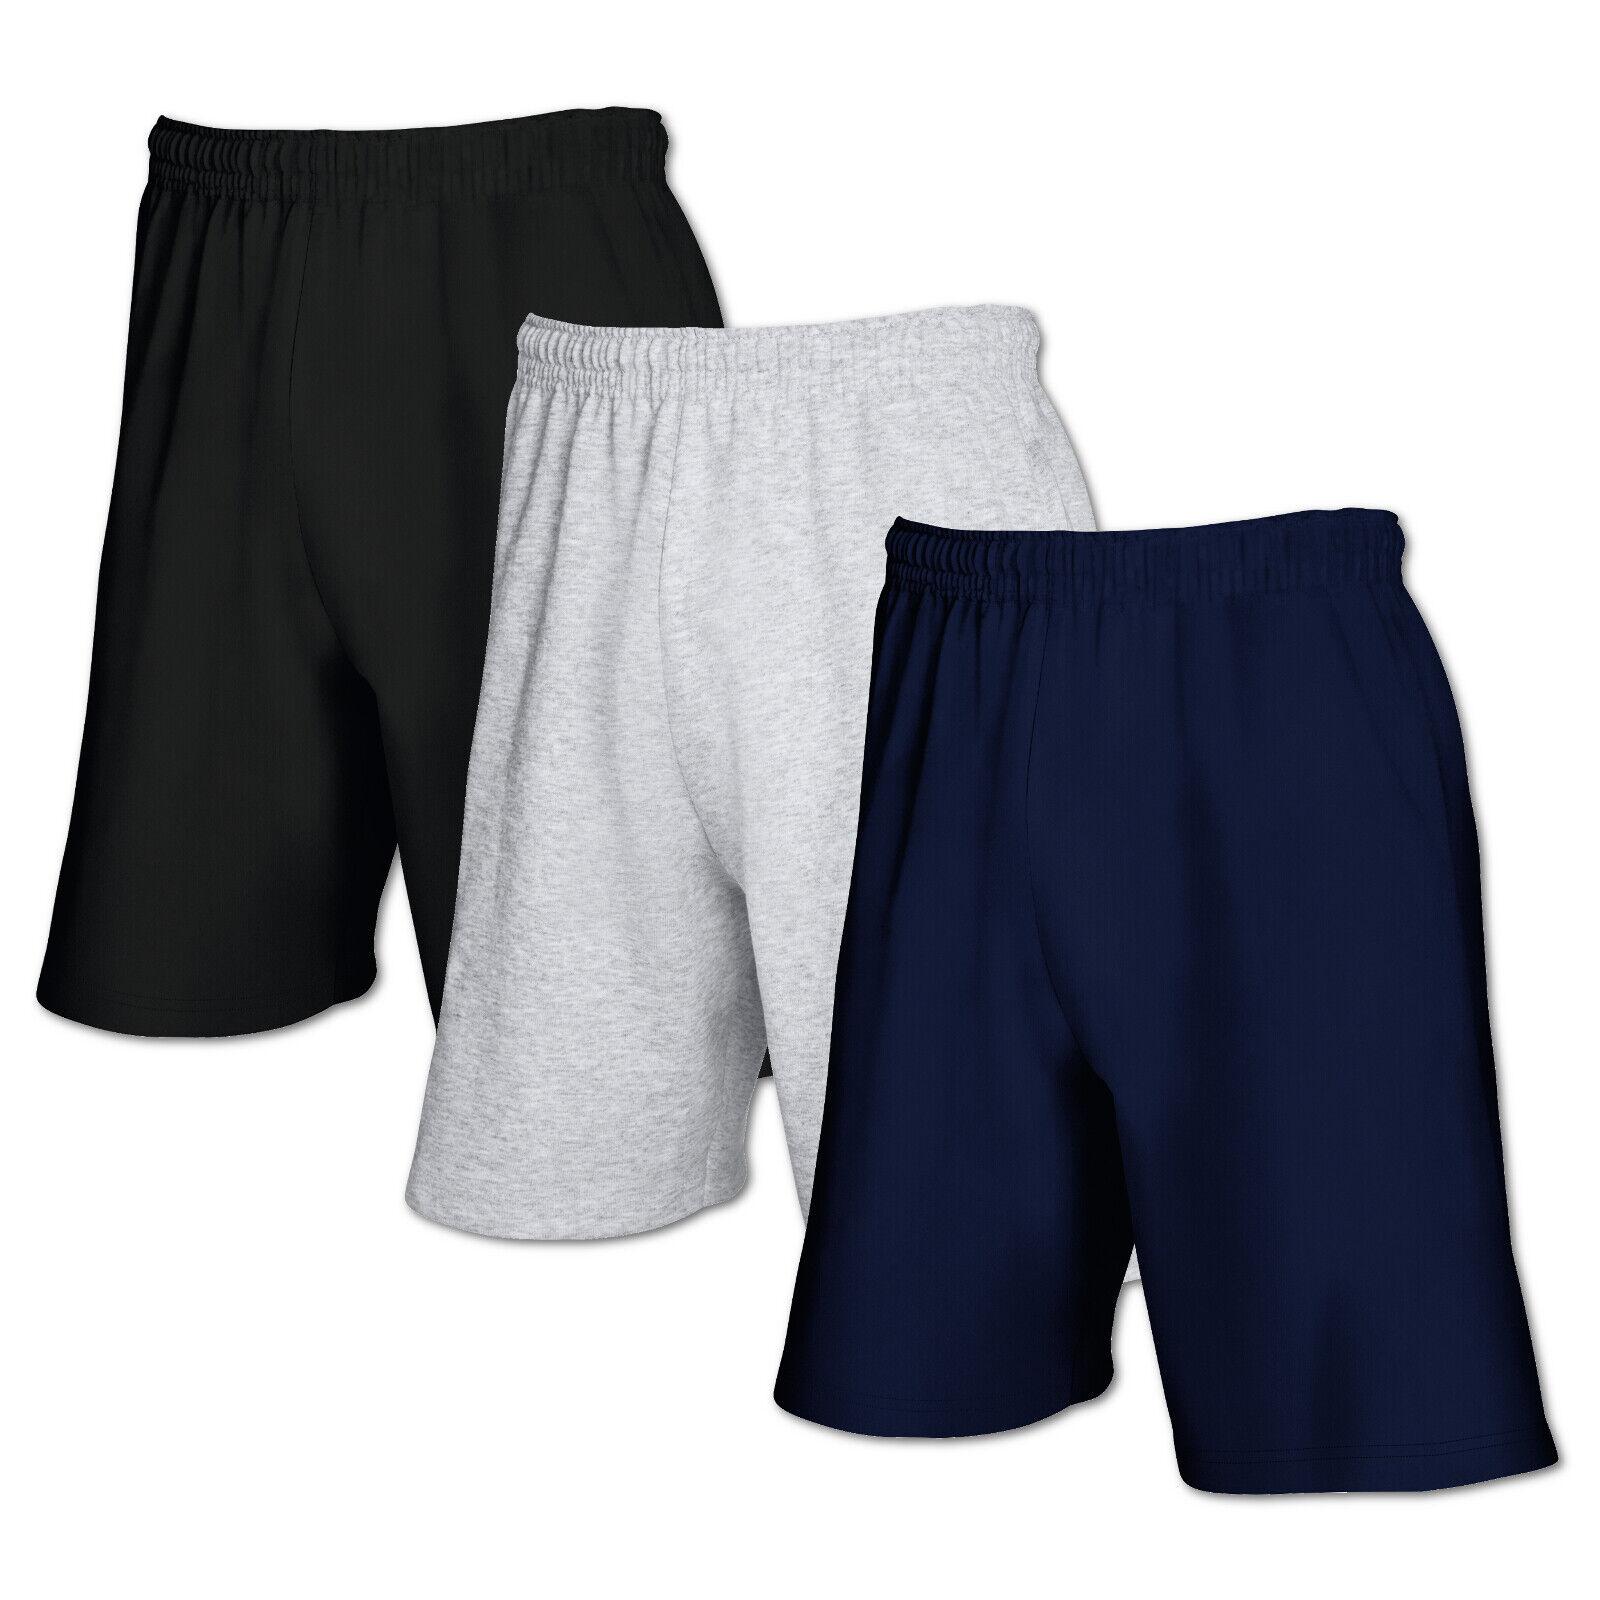 2x Fruit of the Loom Shorts Jogginghose kurze Hose Sport Fitness Gym Bermuda